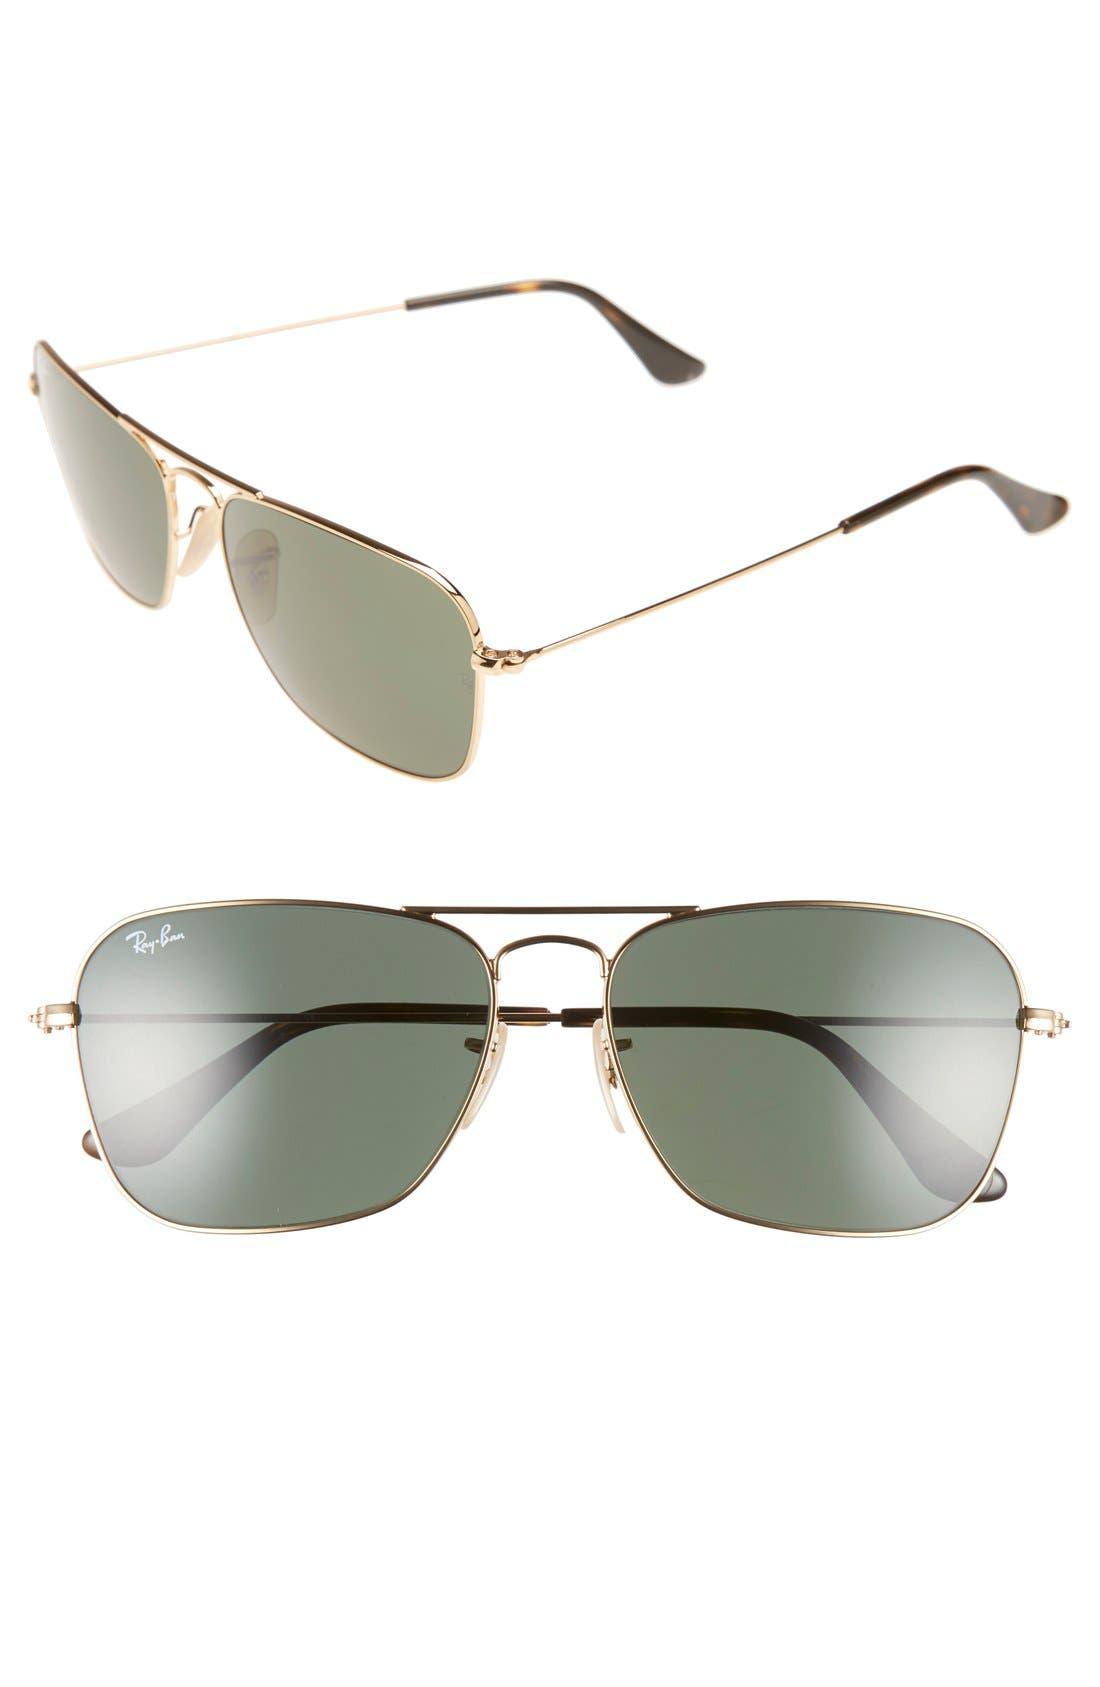 RAY-BAN Caravan 58mm Aviator Sunglasses, Main, color, GOLD/ DARK GREEN